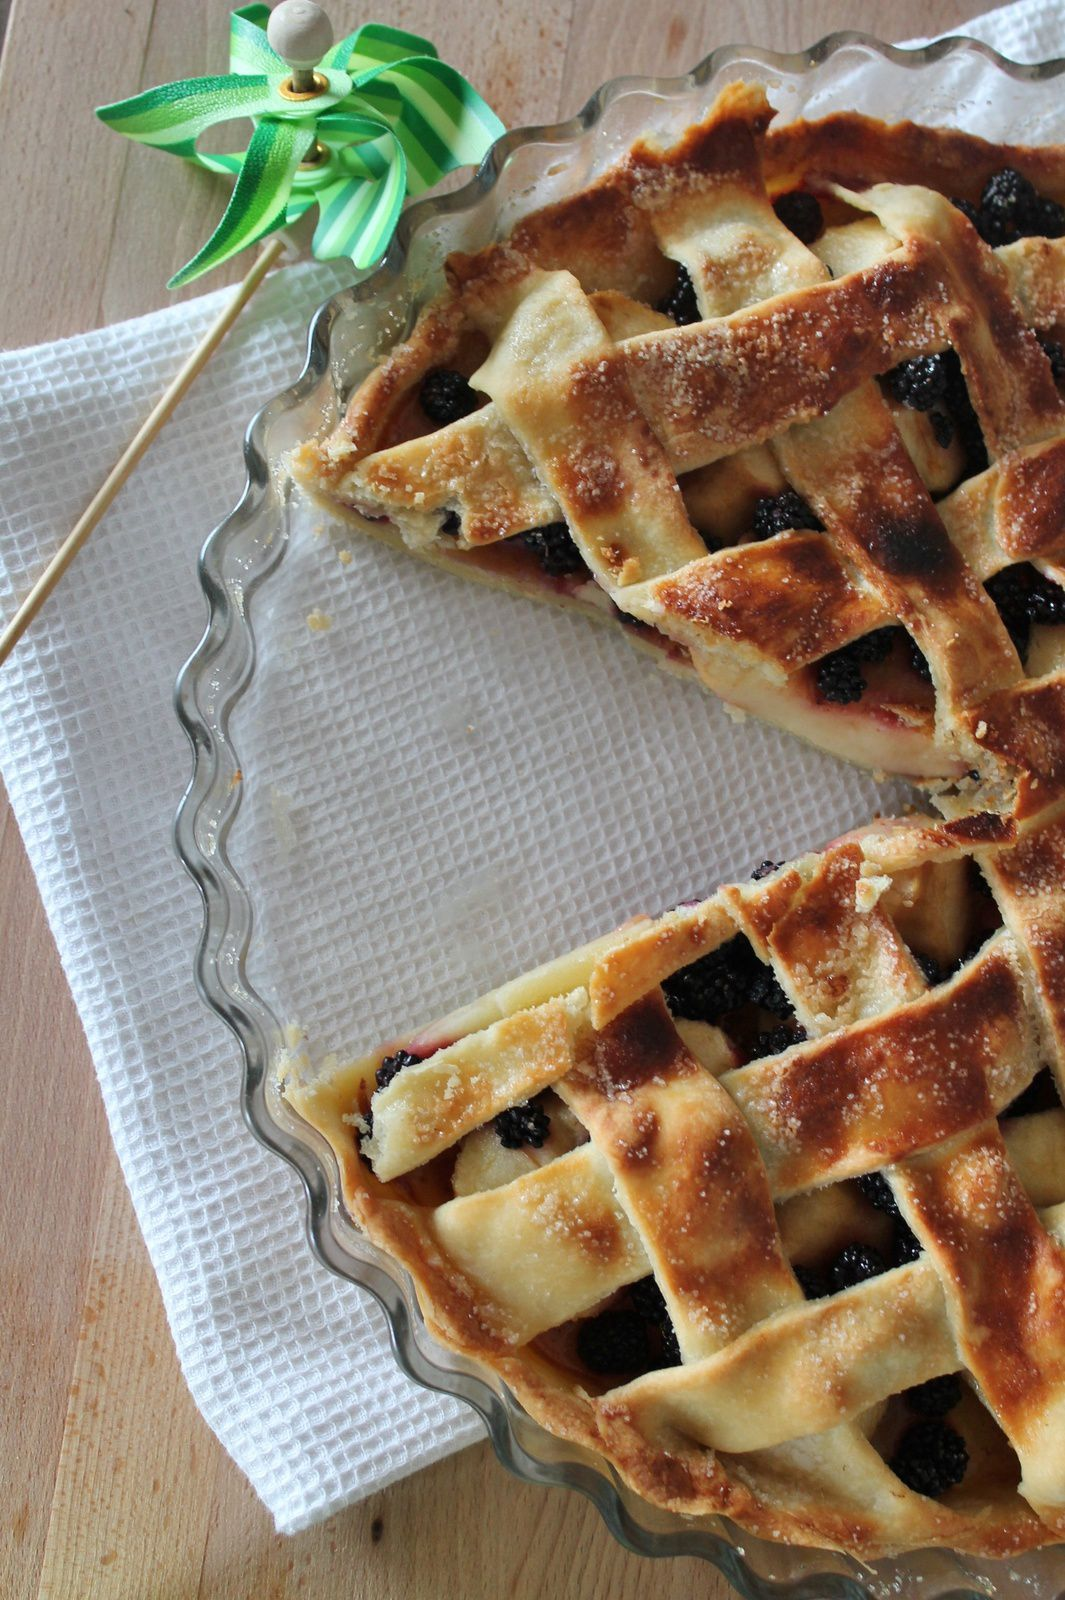 tarta de poma (tarte aux pommes)